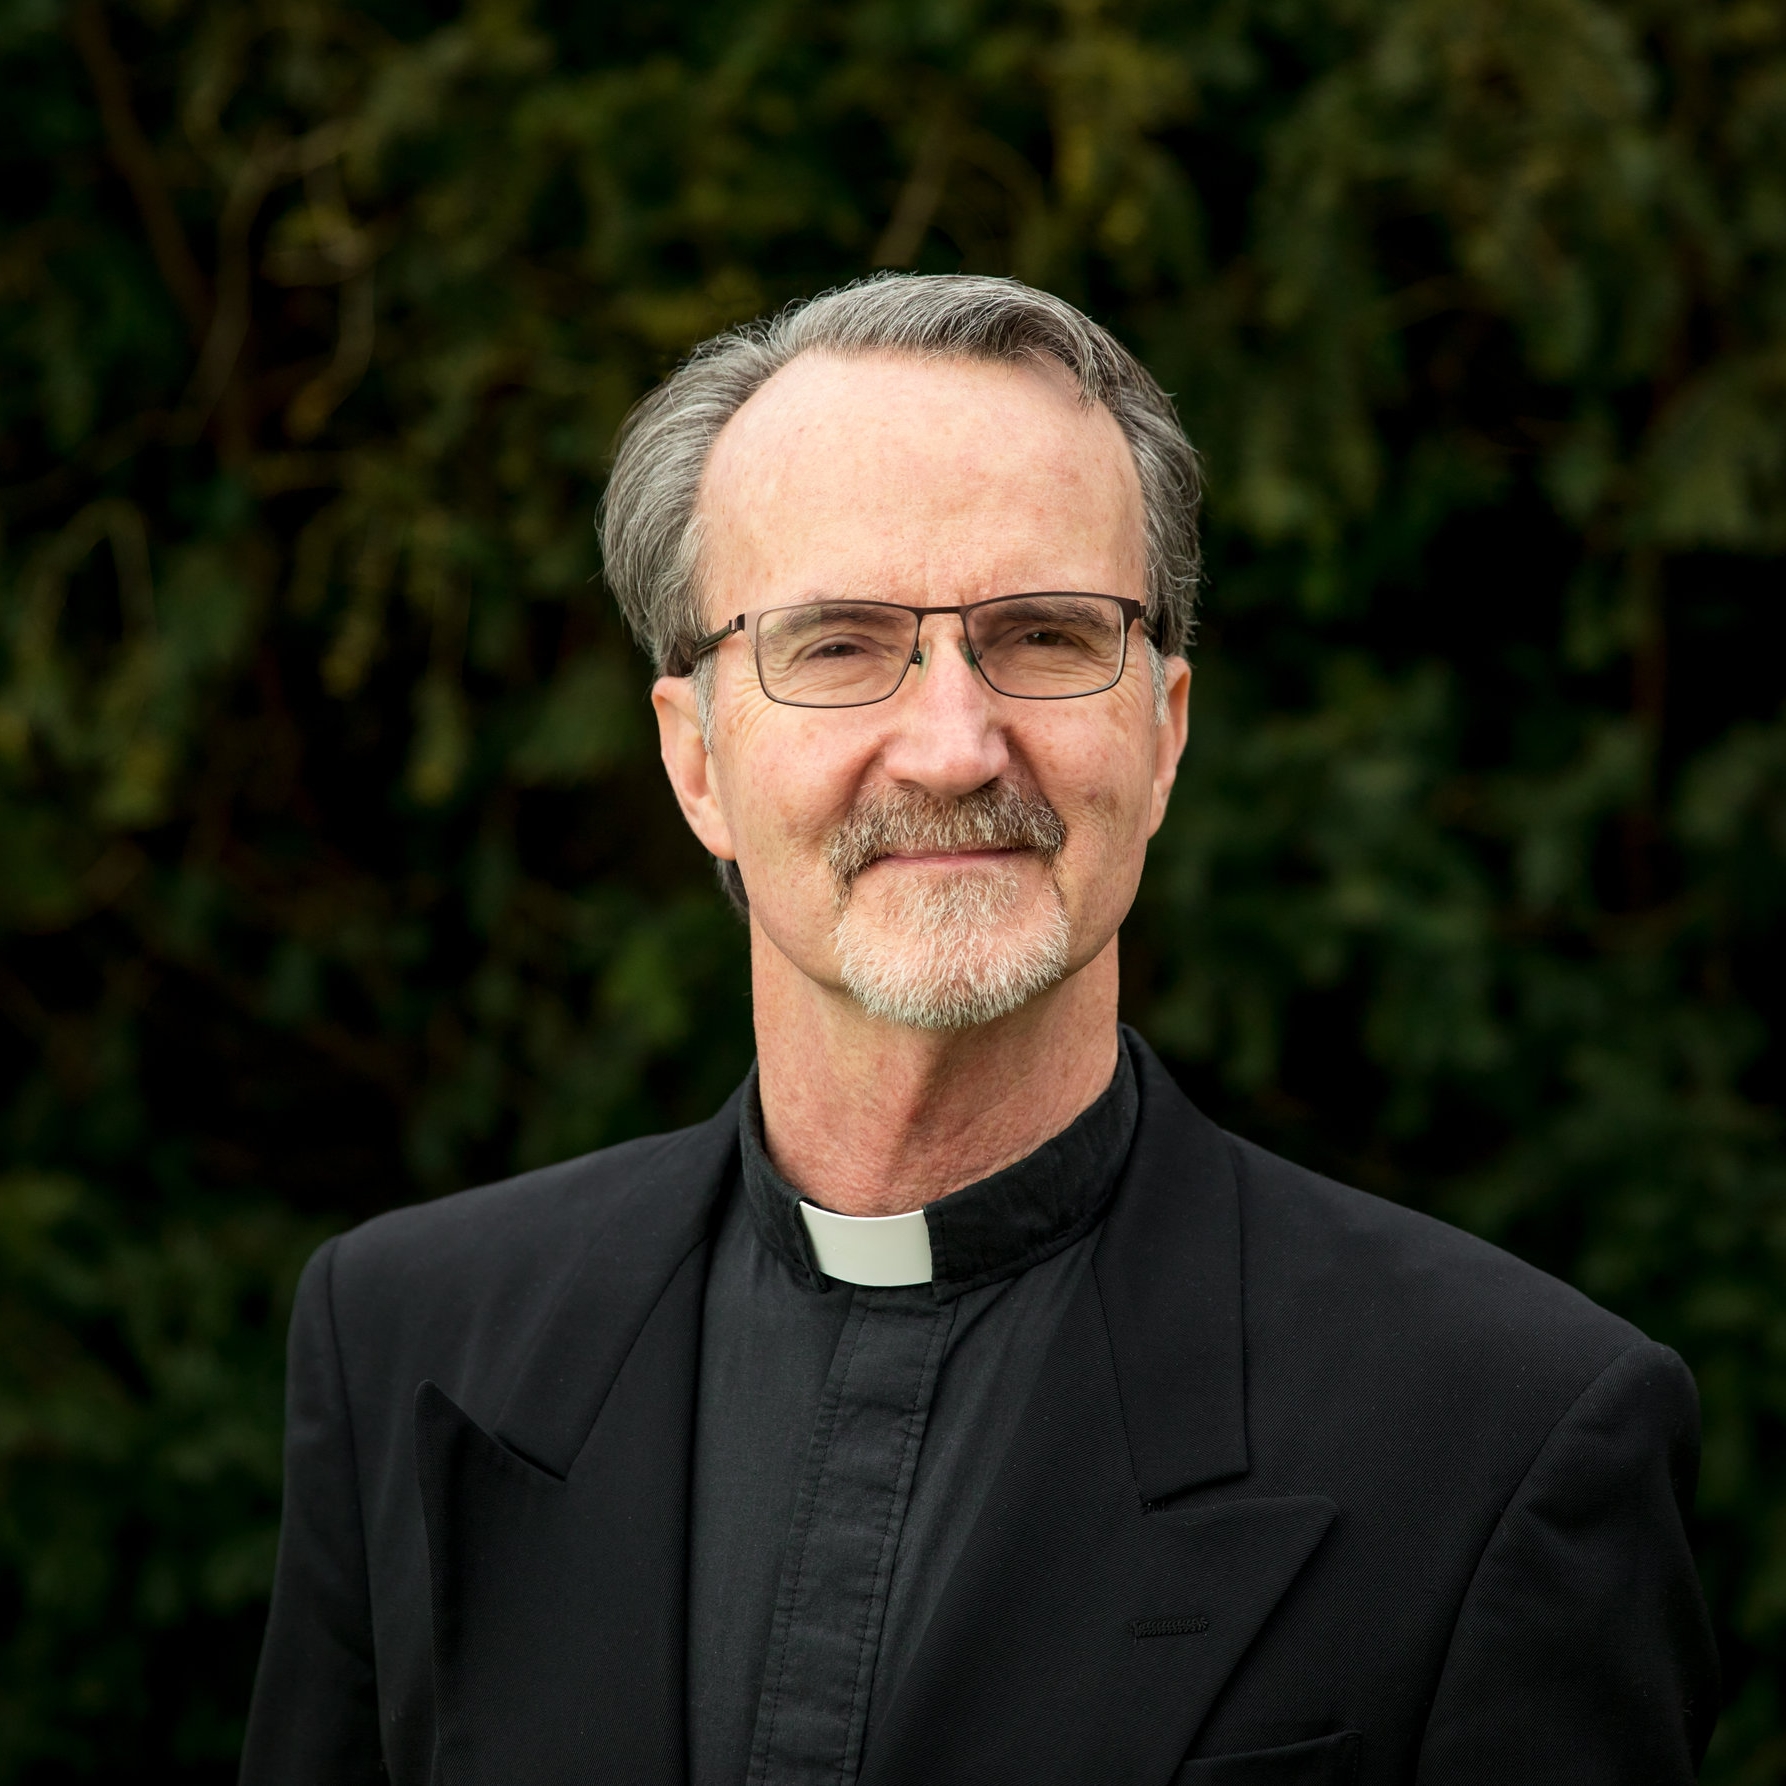 Fr Michael Sparough, SJ